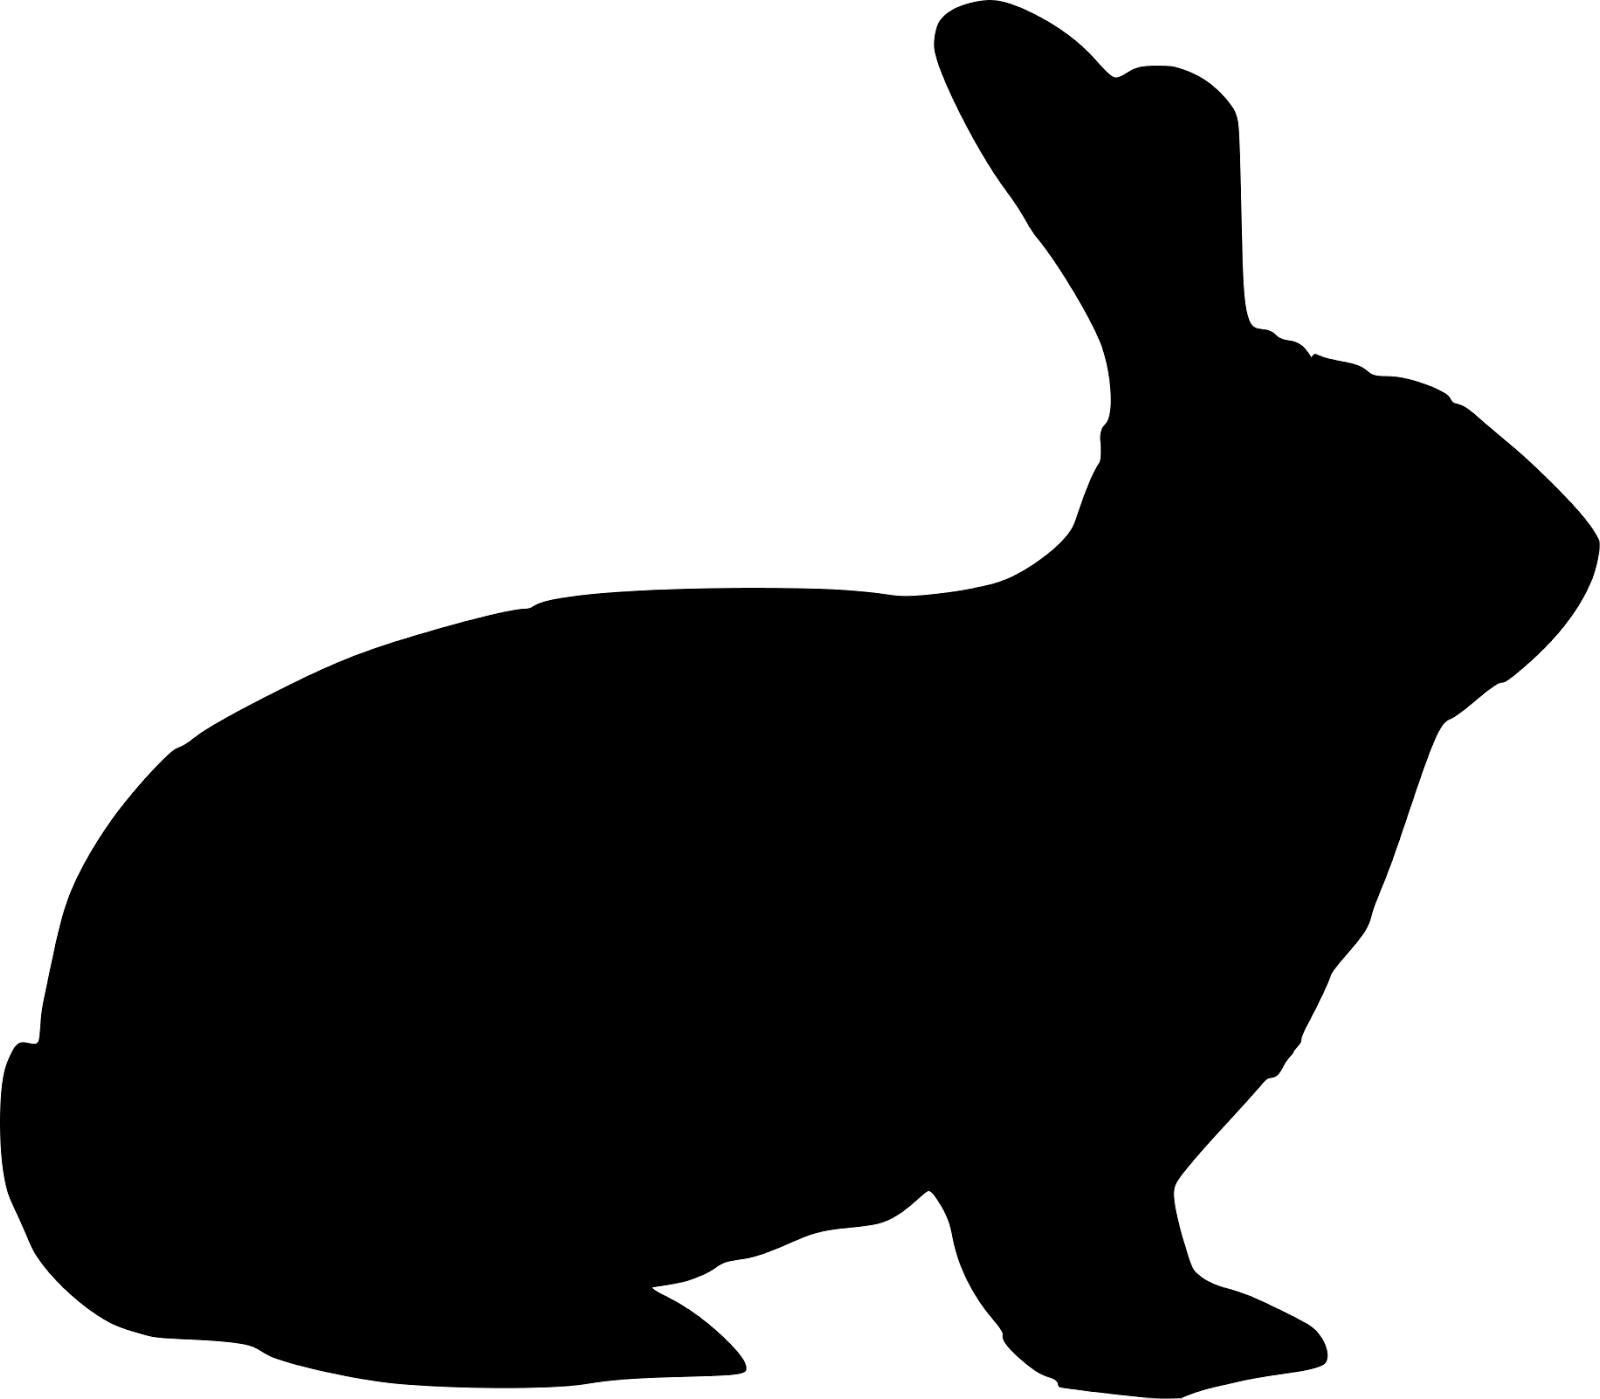 1600x1399 Bunny Clipart Silhouette